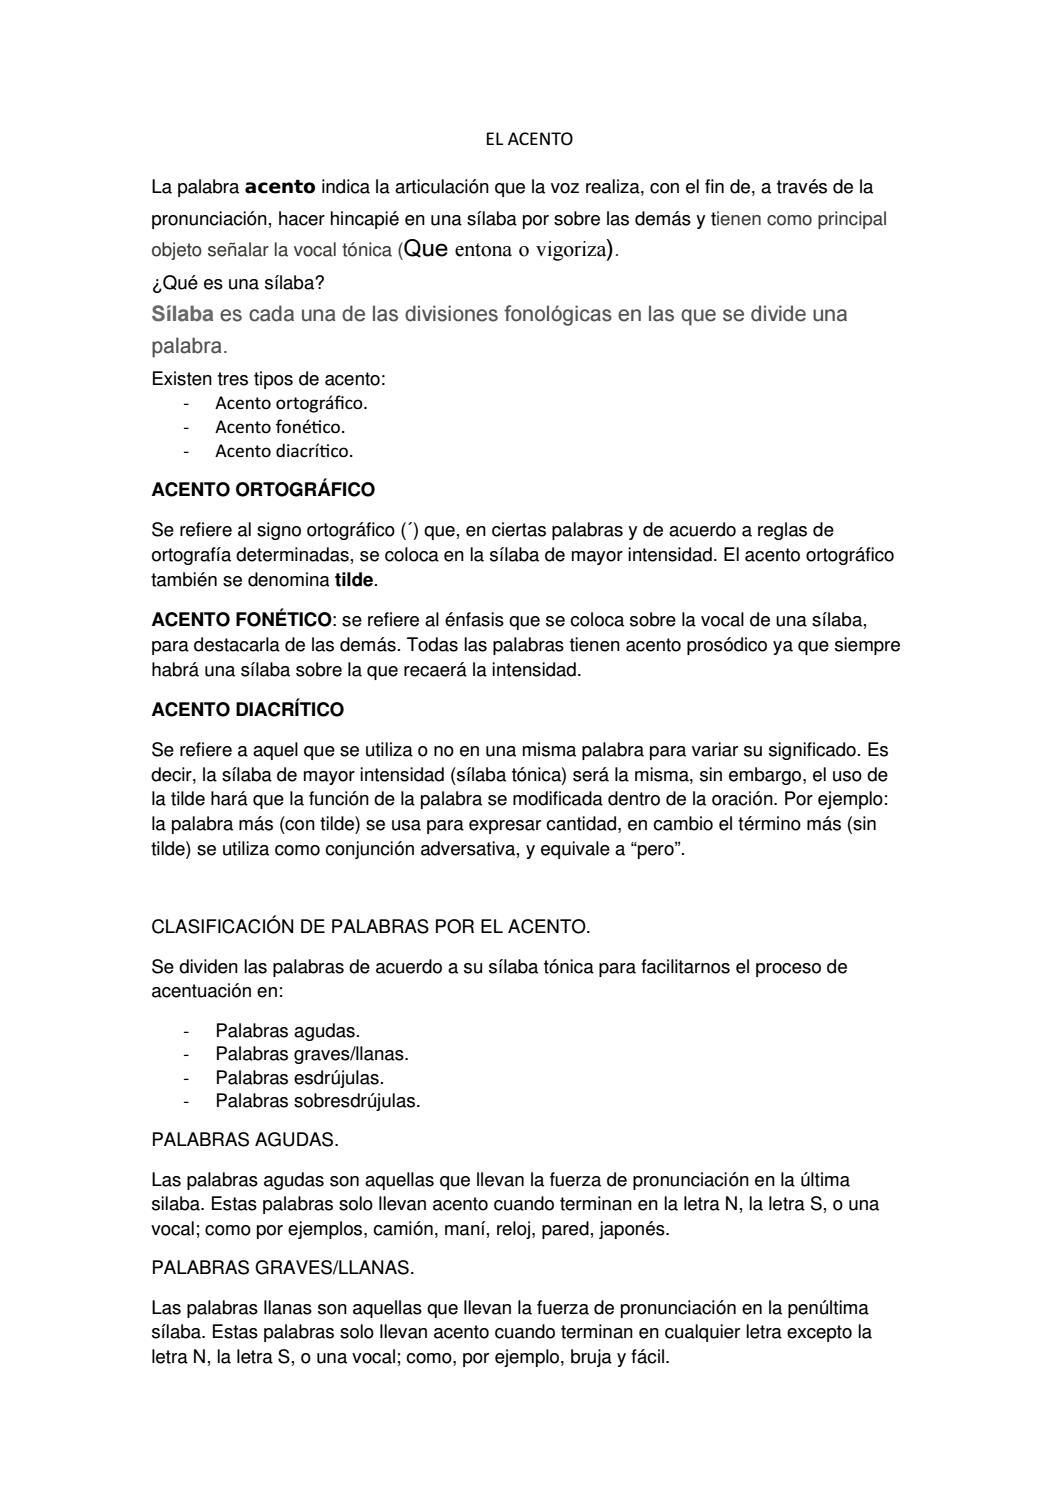 Chriss Acento Encalada Aguilar Informe OrtográficoBy Issuu De yYb7gv6f